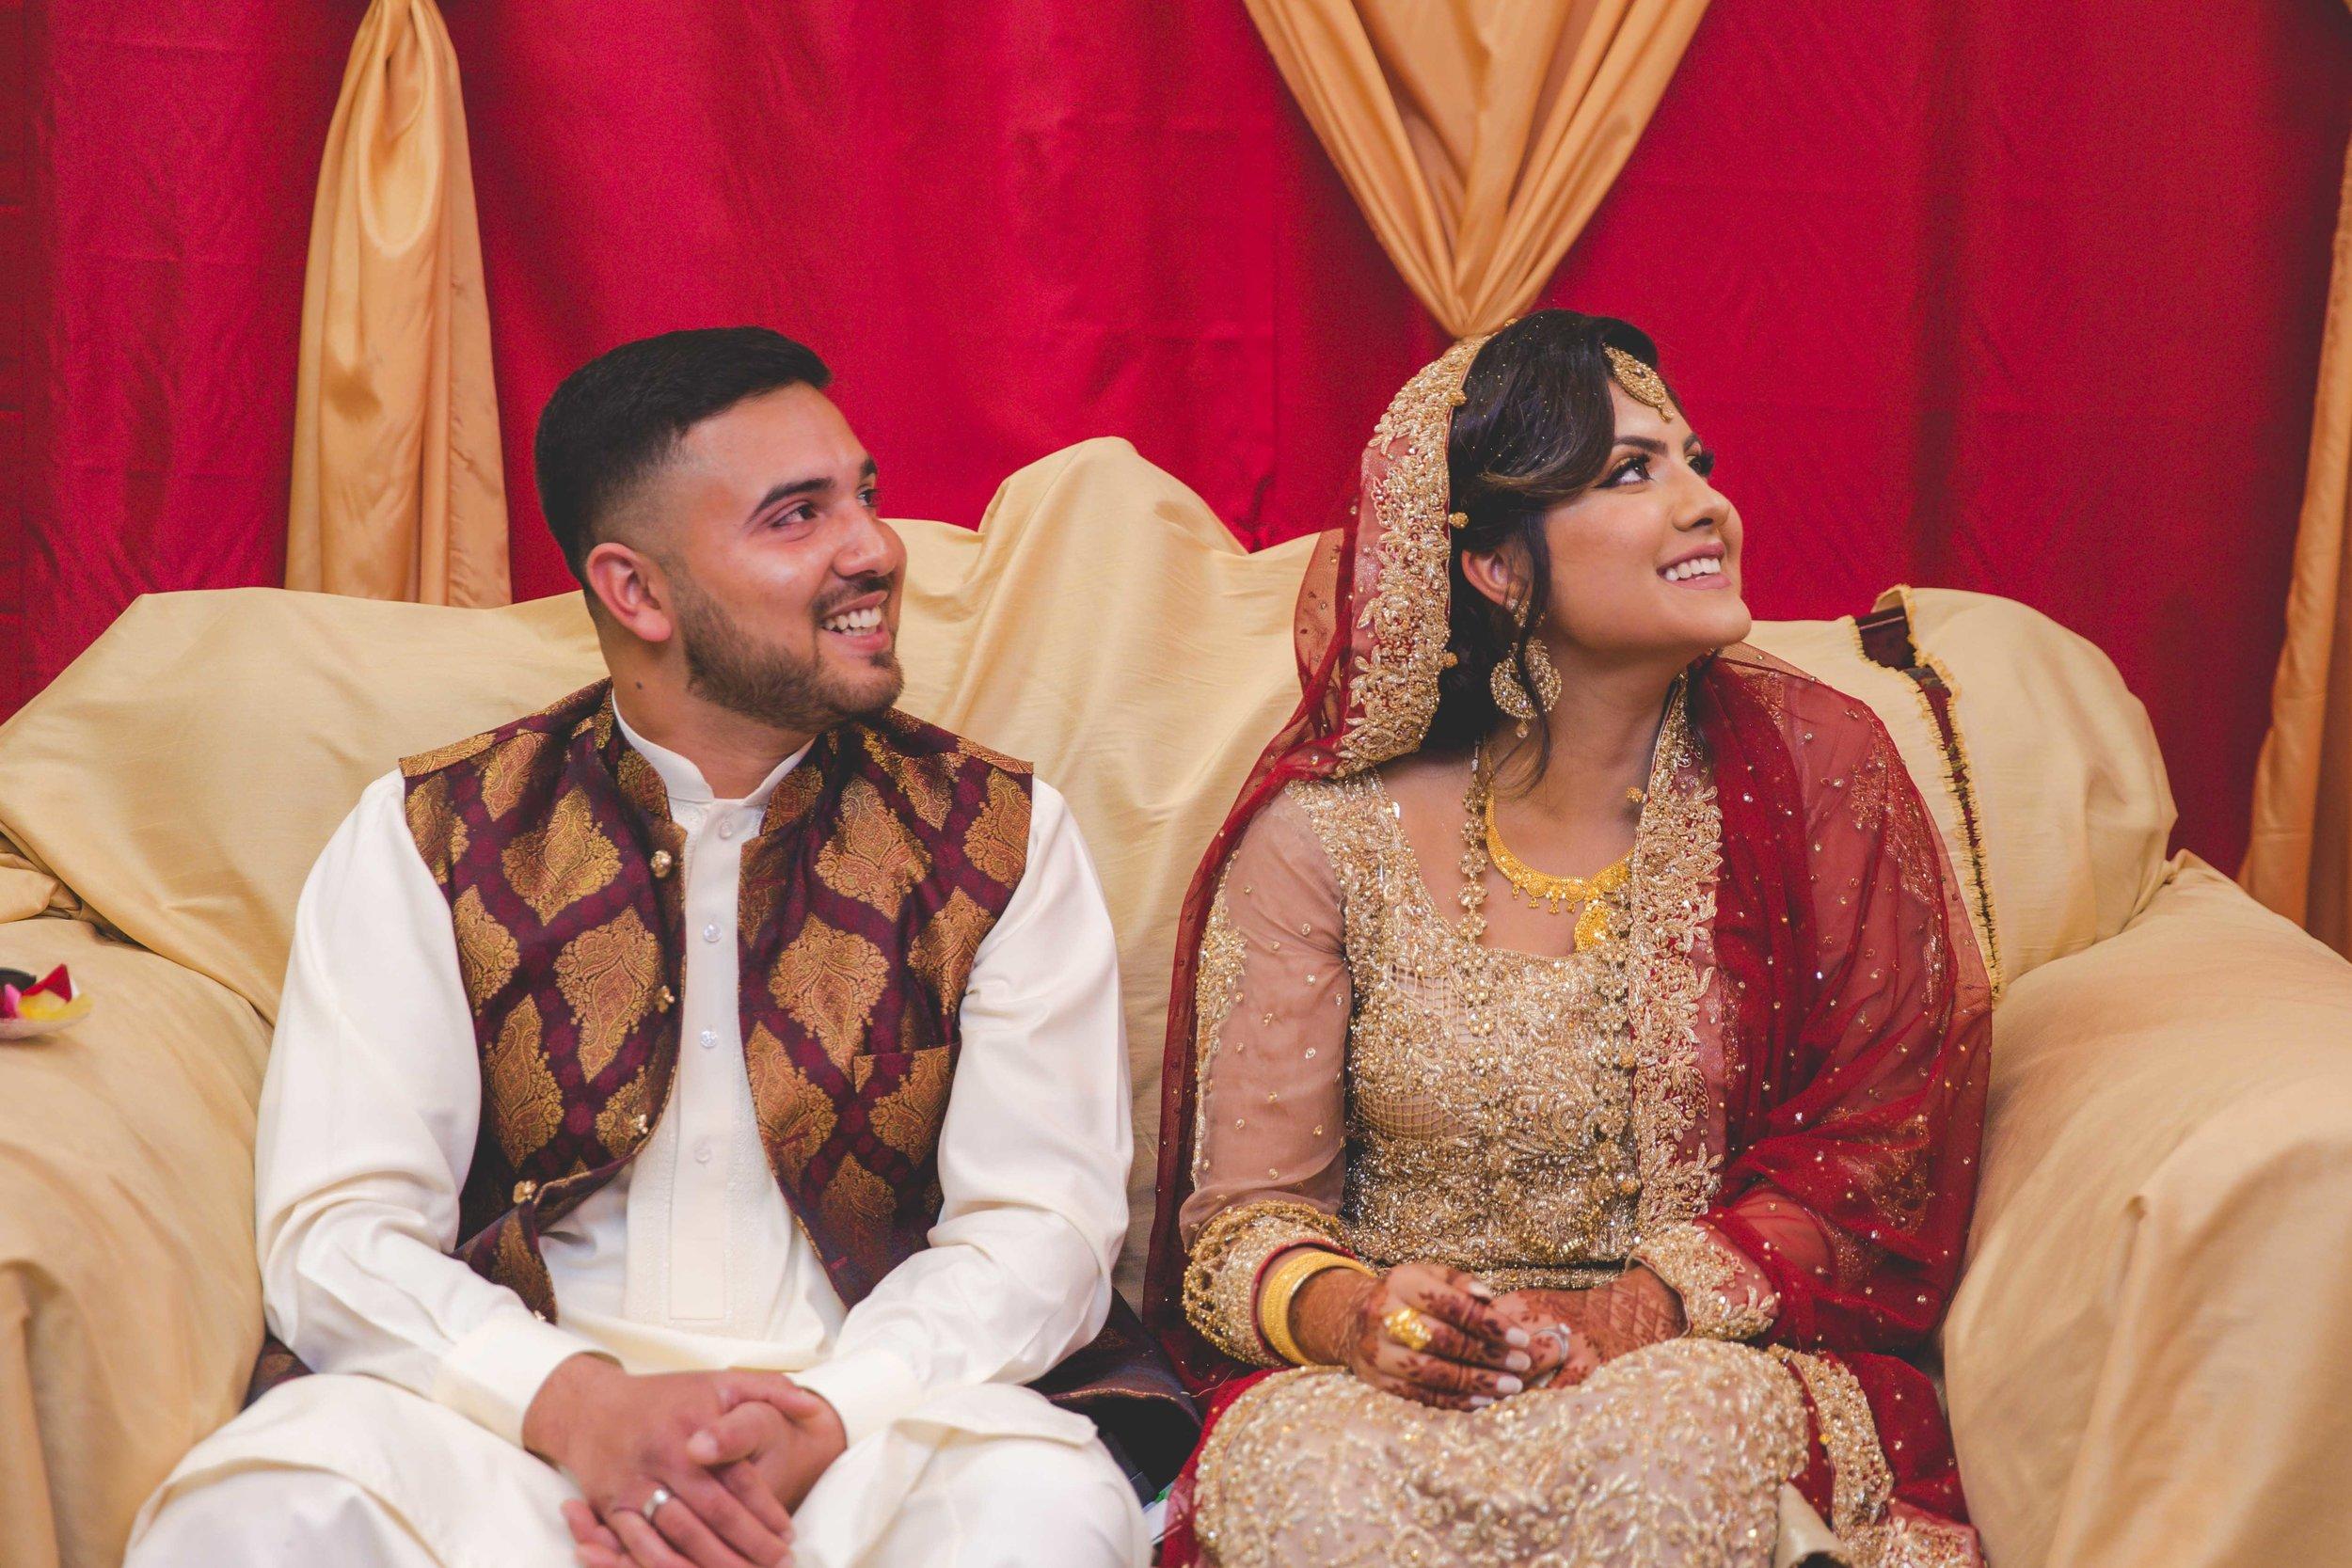 pakistani-wedding-photographer-brooklyn-new-york-23.jpg